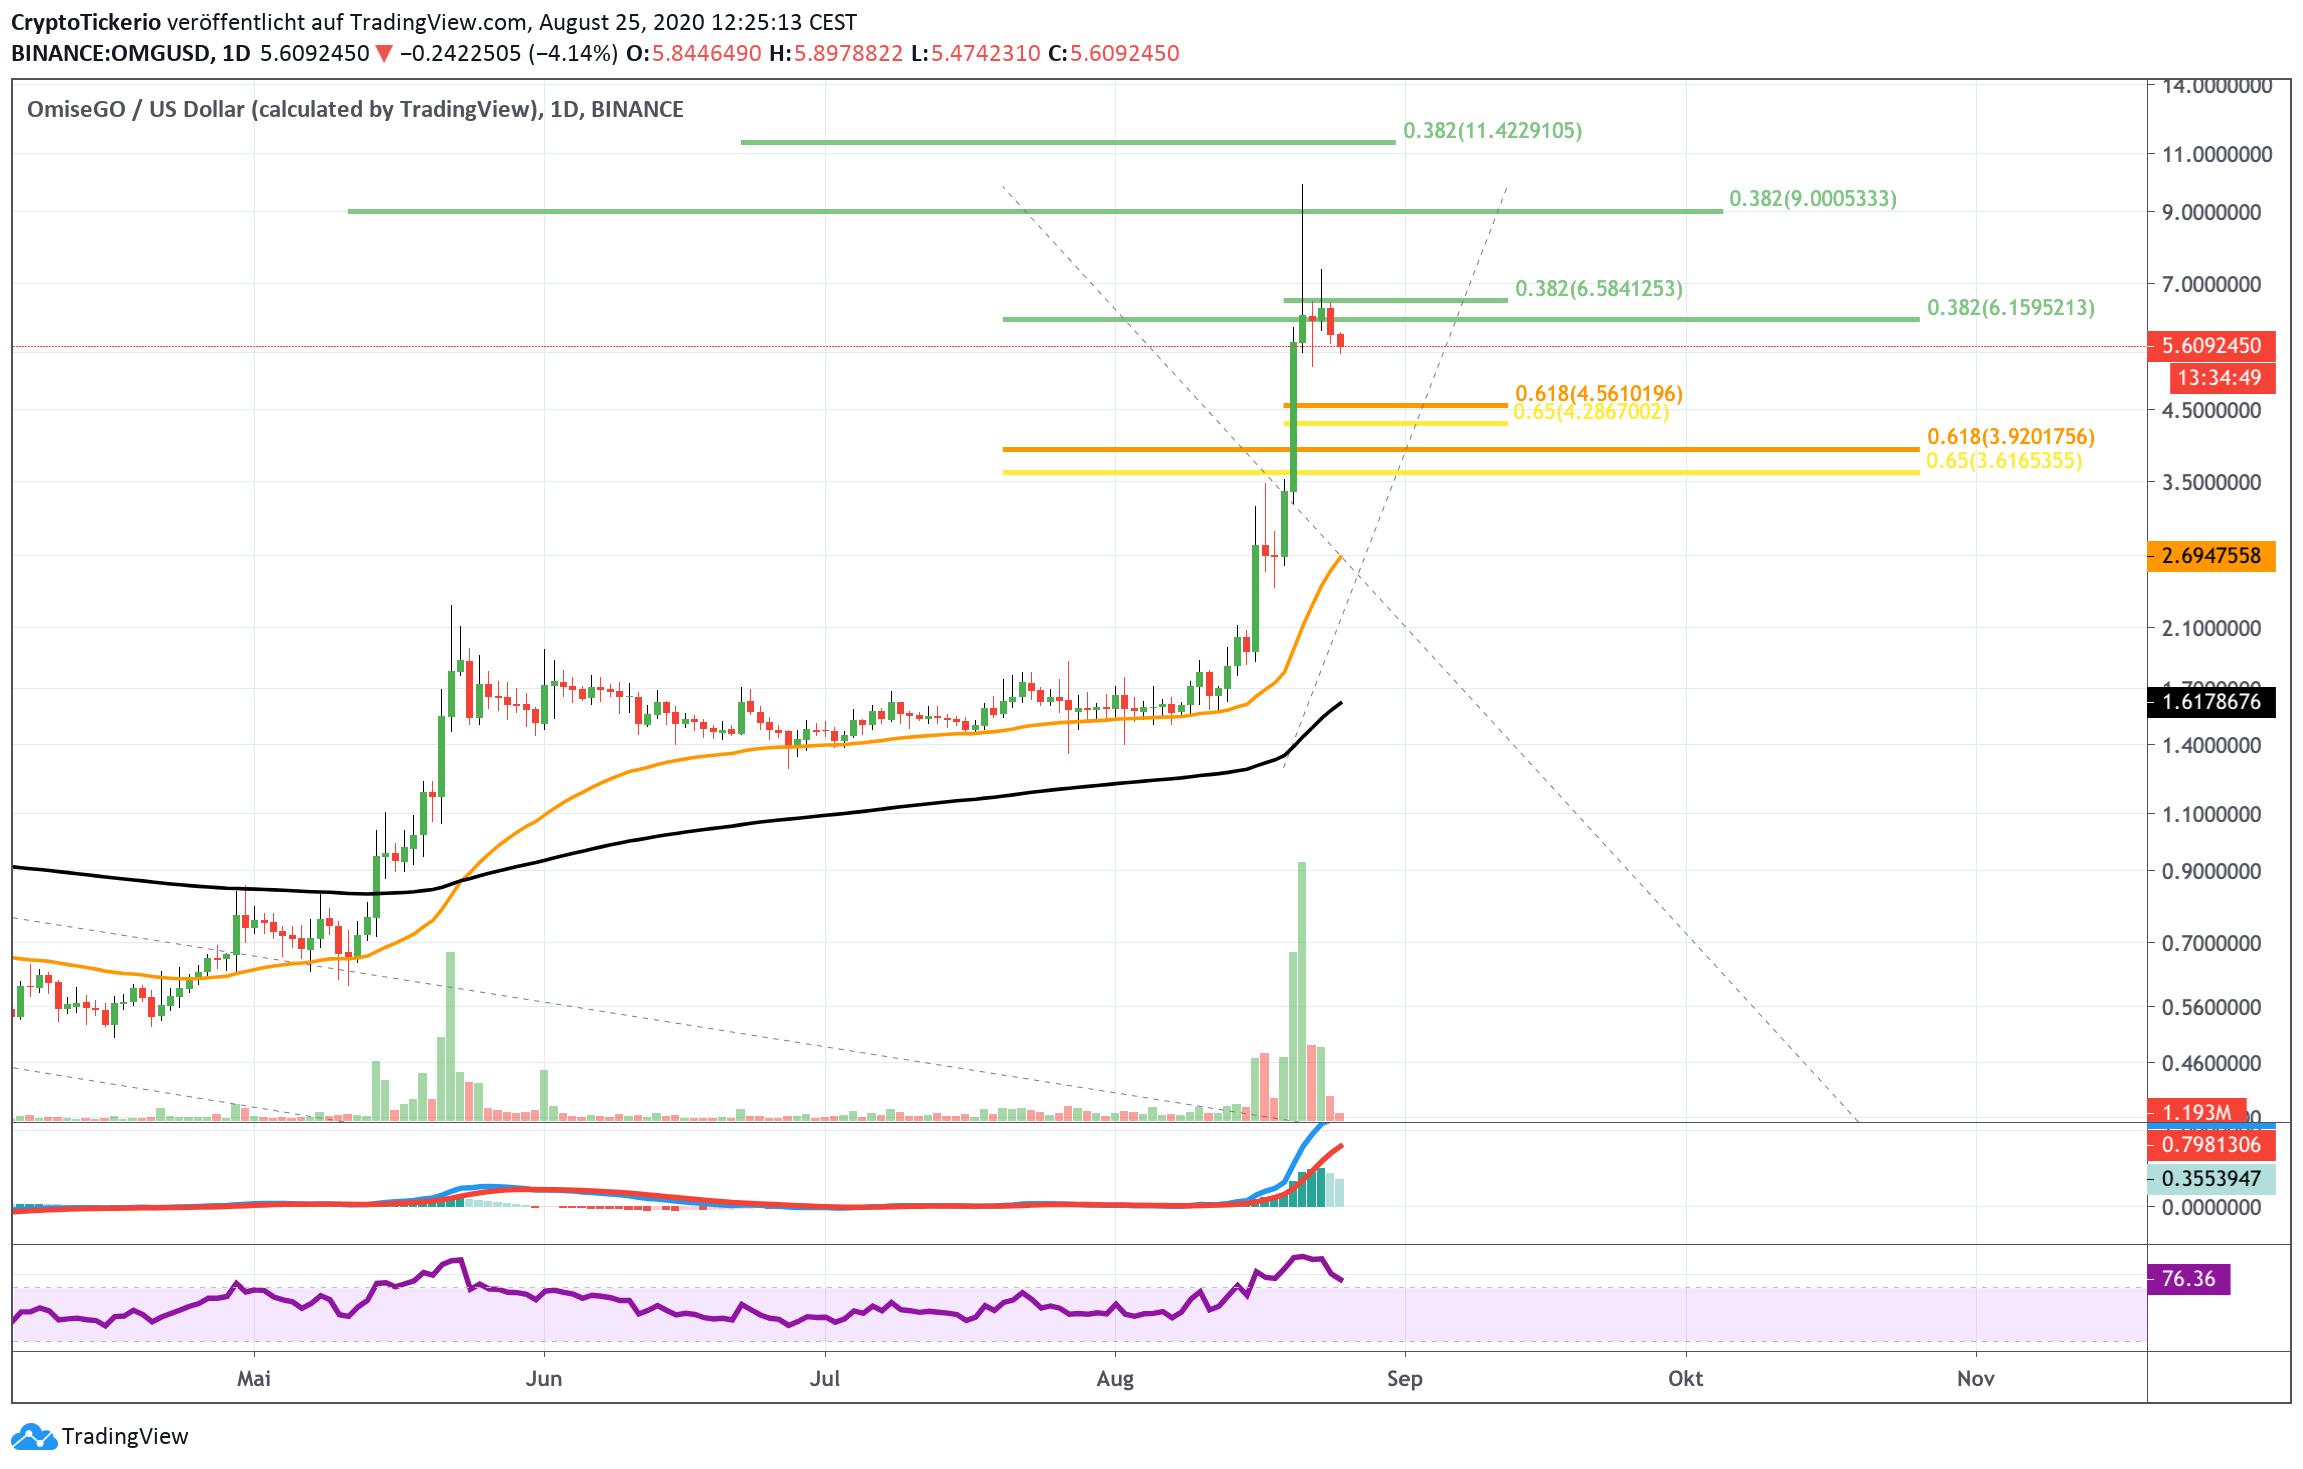 OMG/USD Daily - Tradingview